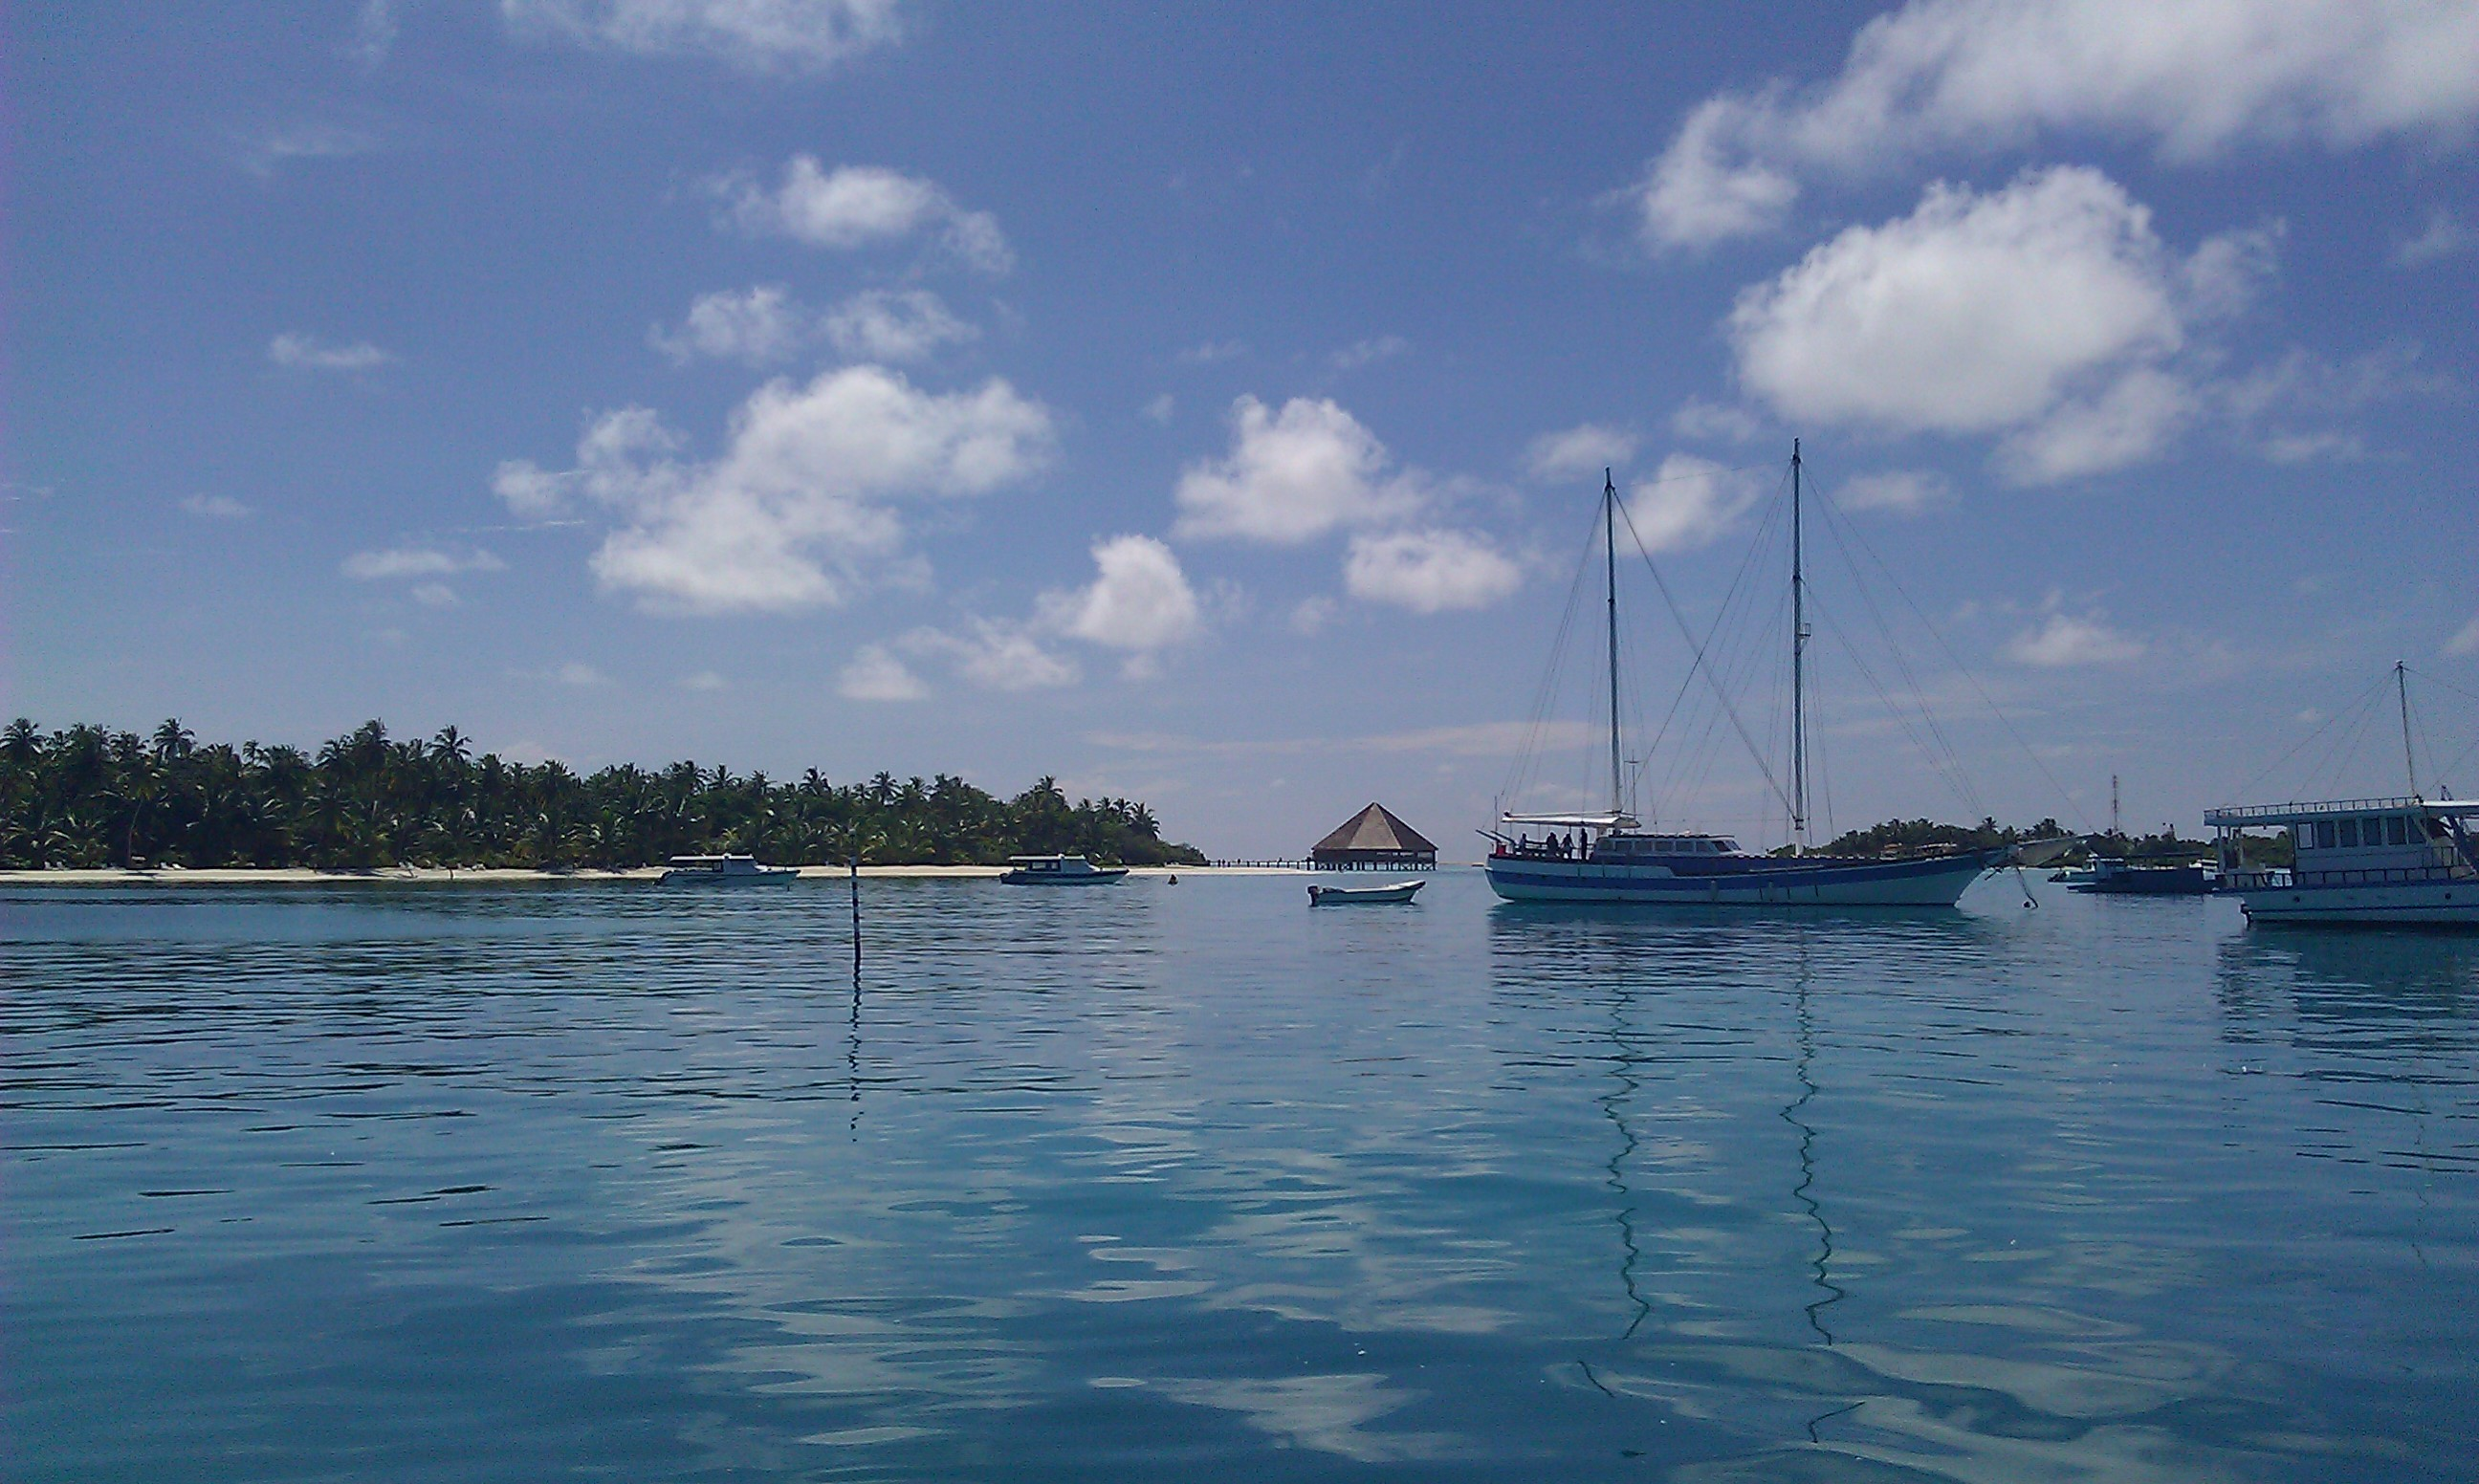 Maldives by boat